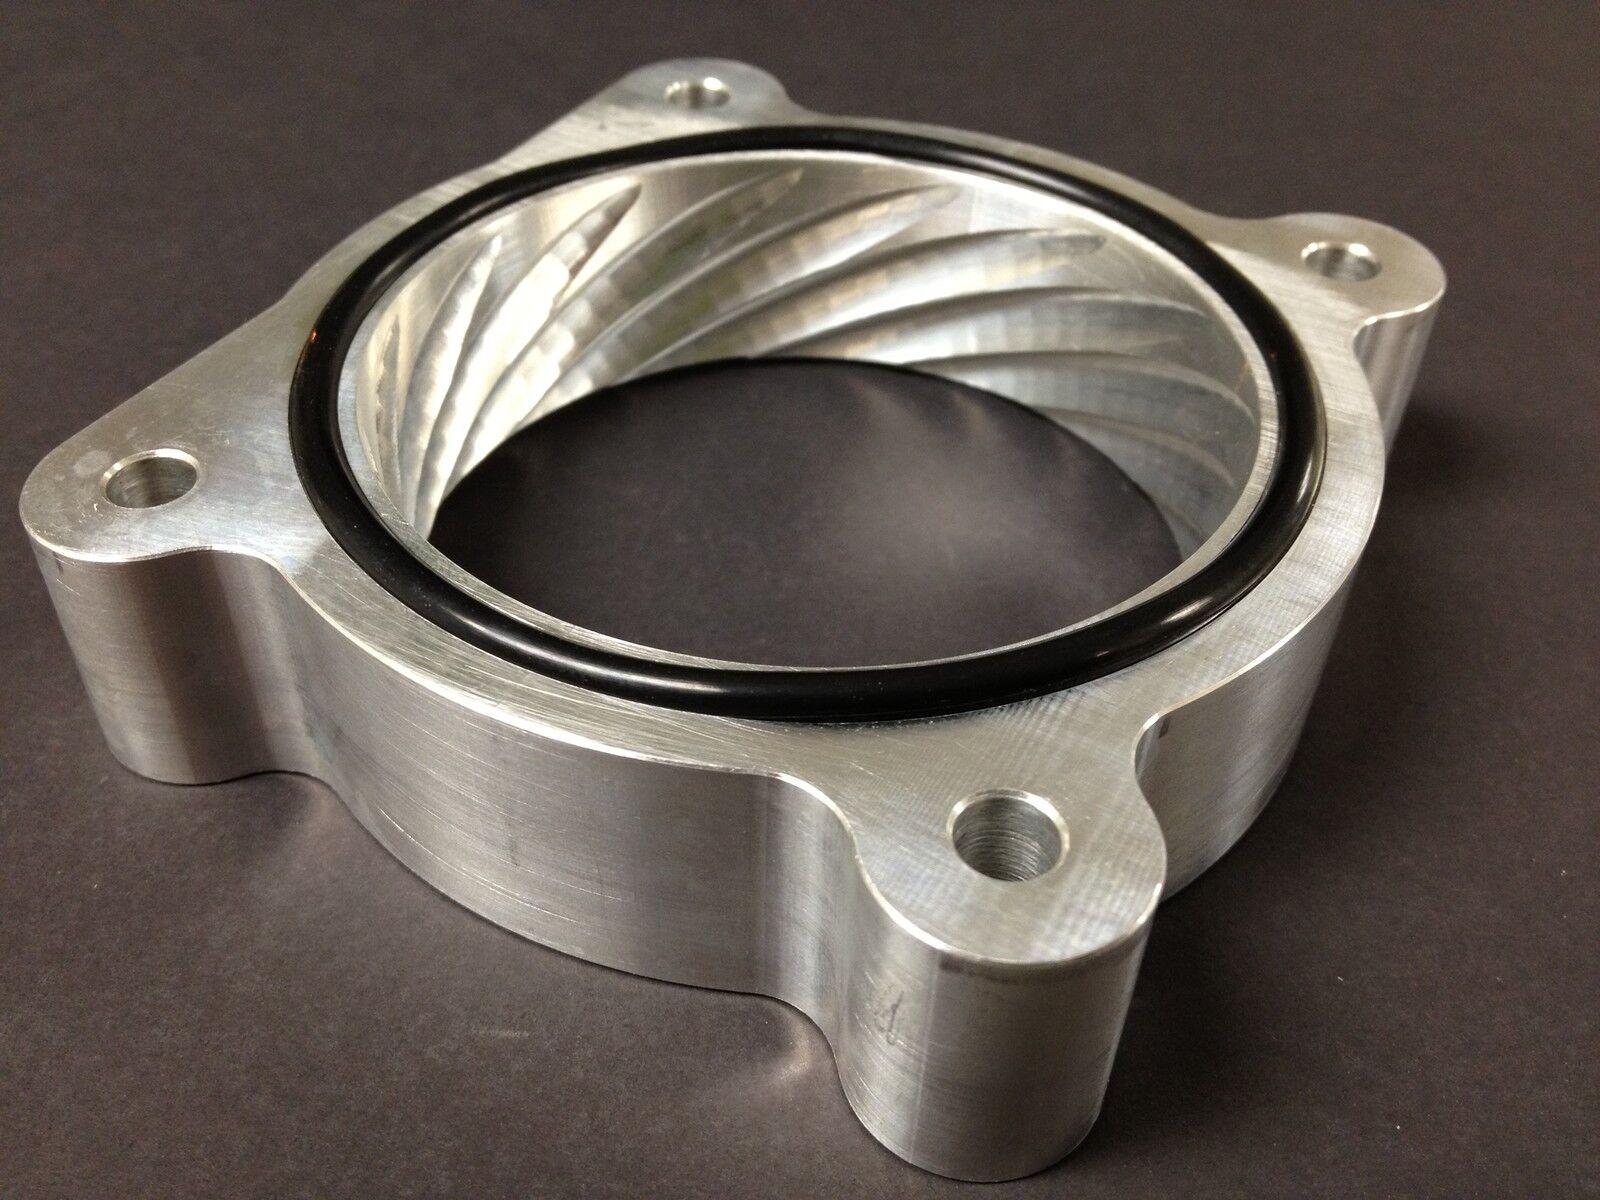 Throttle Body Spacer for 2005-2018 Nissan FRONTIER   XTERRA  4.0l  v6 X710-C